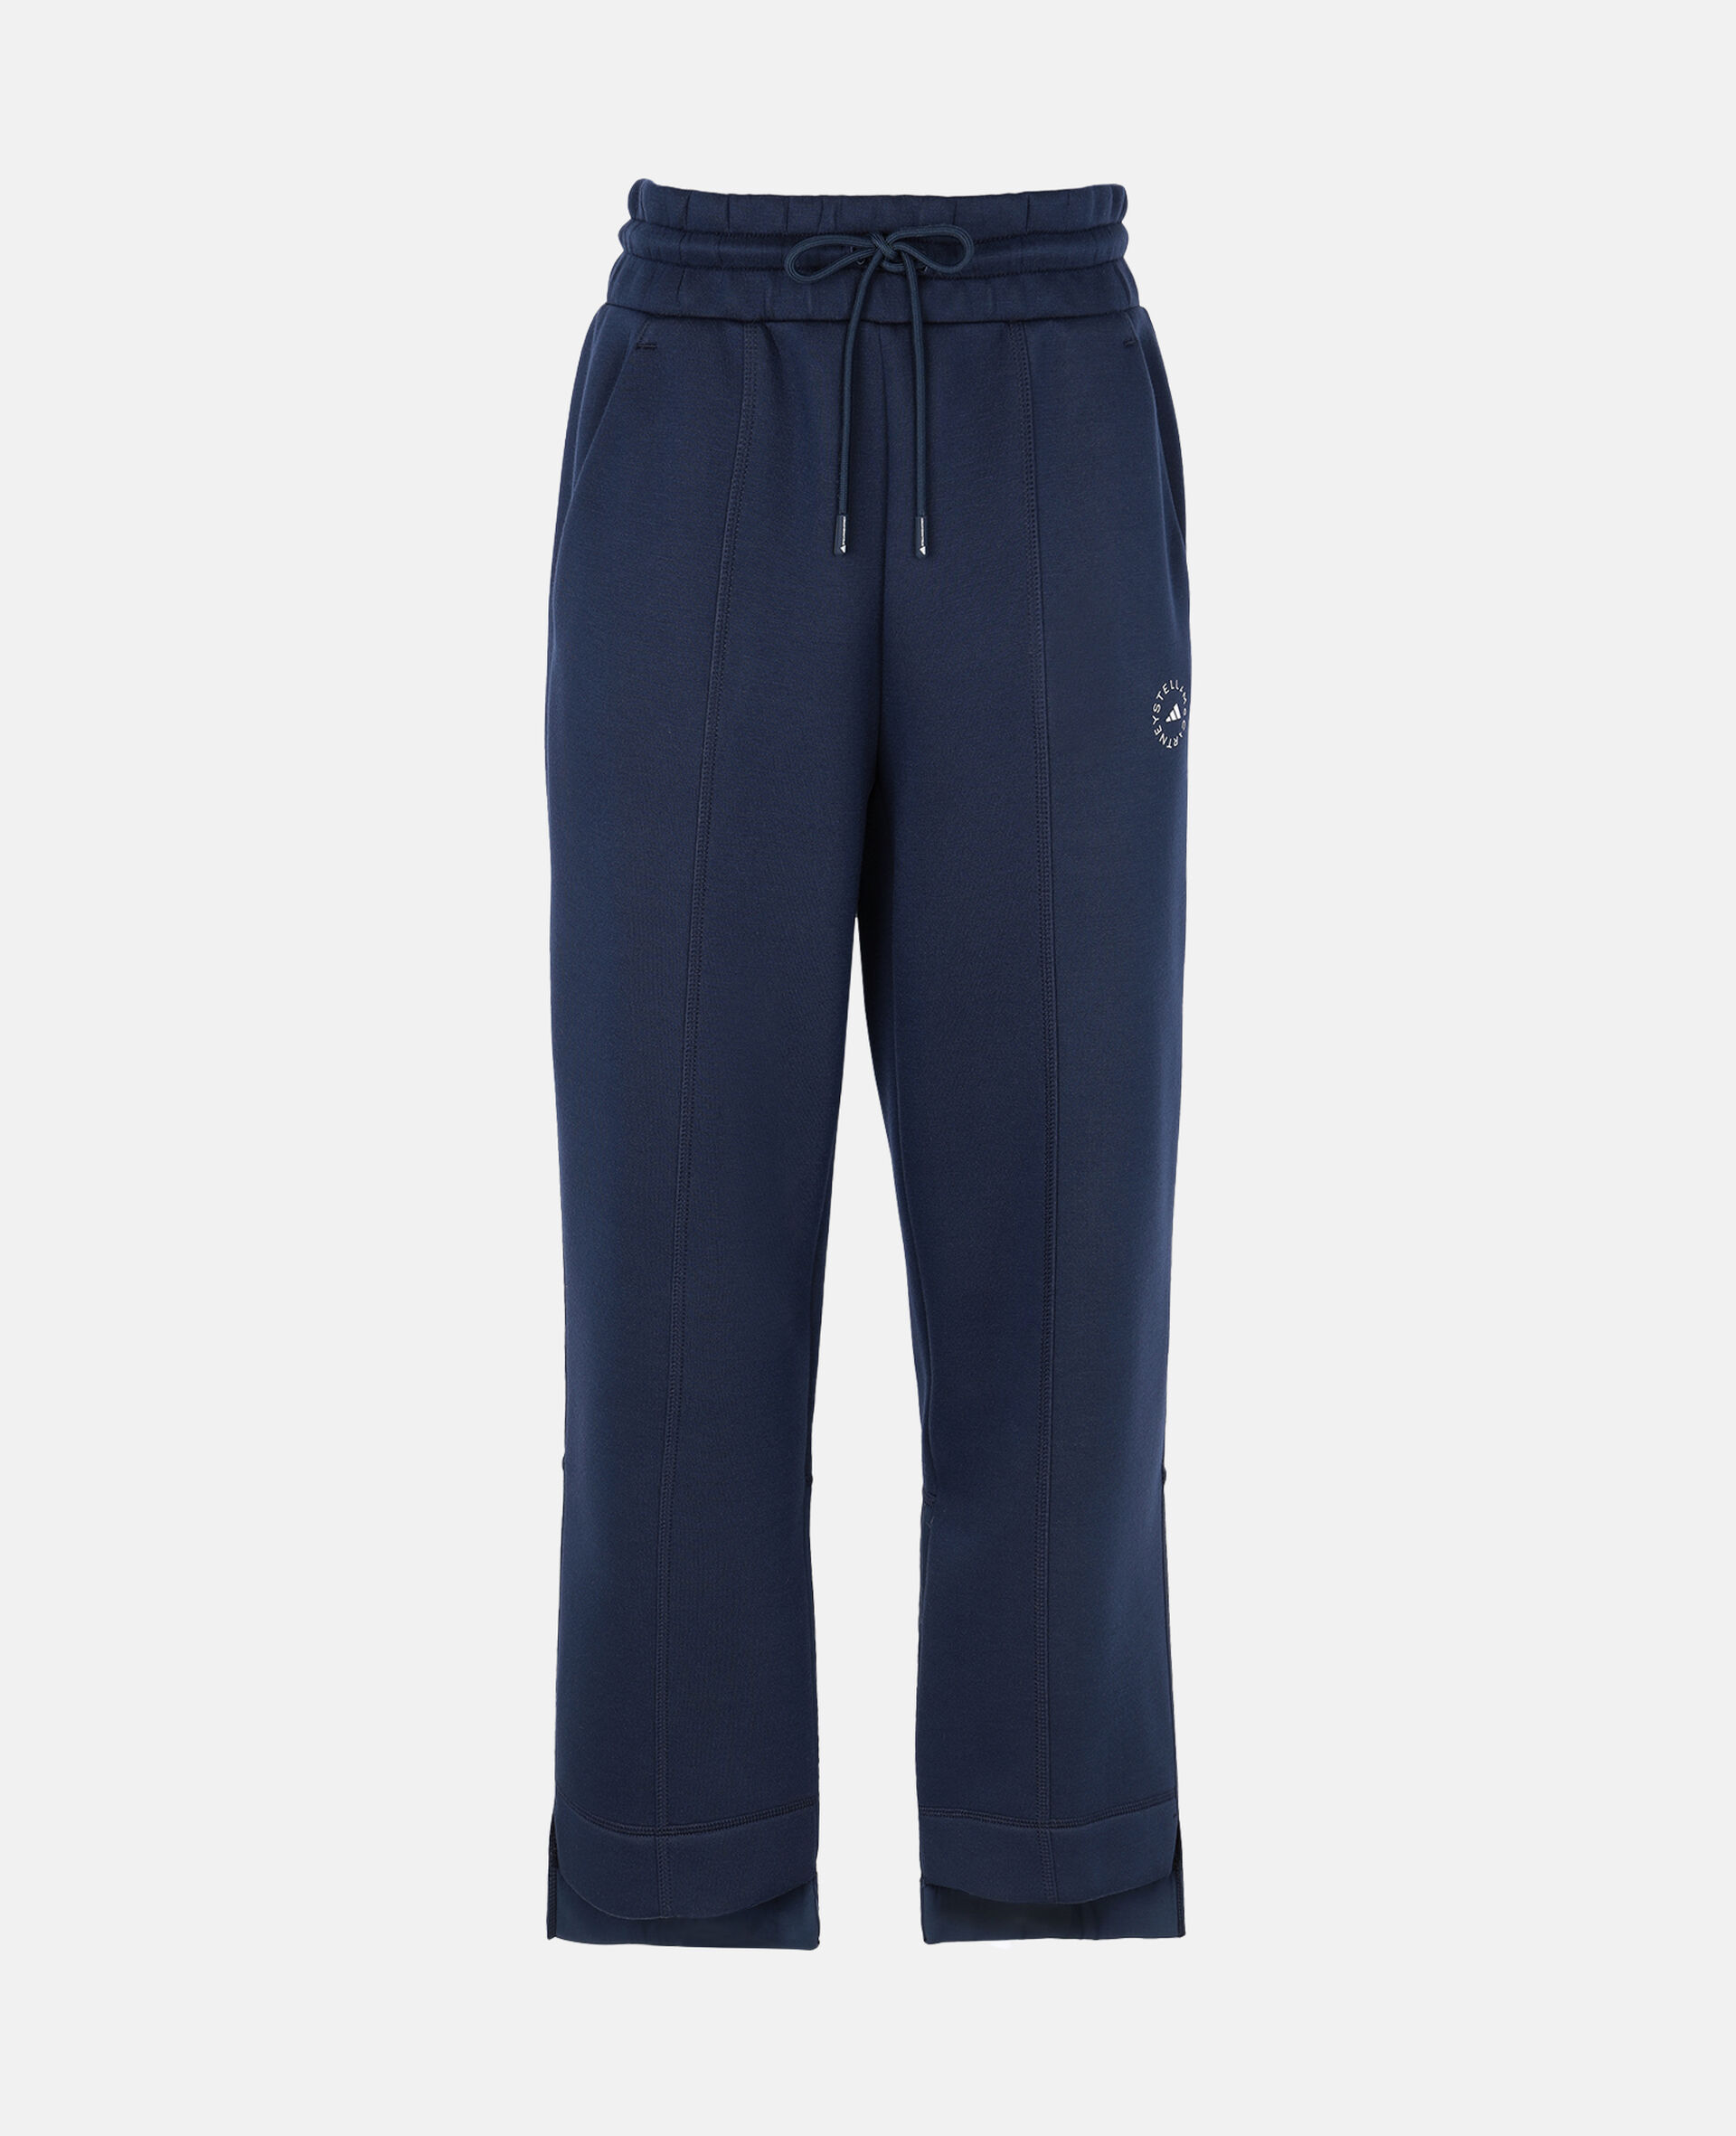 蓝色锥形卫裤-蓝色-large image number 0